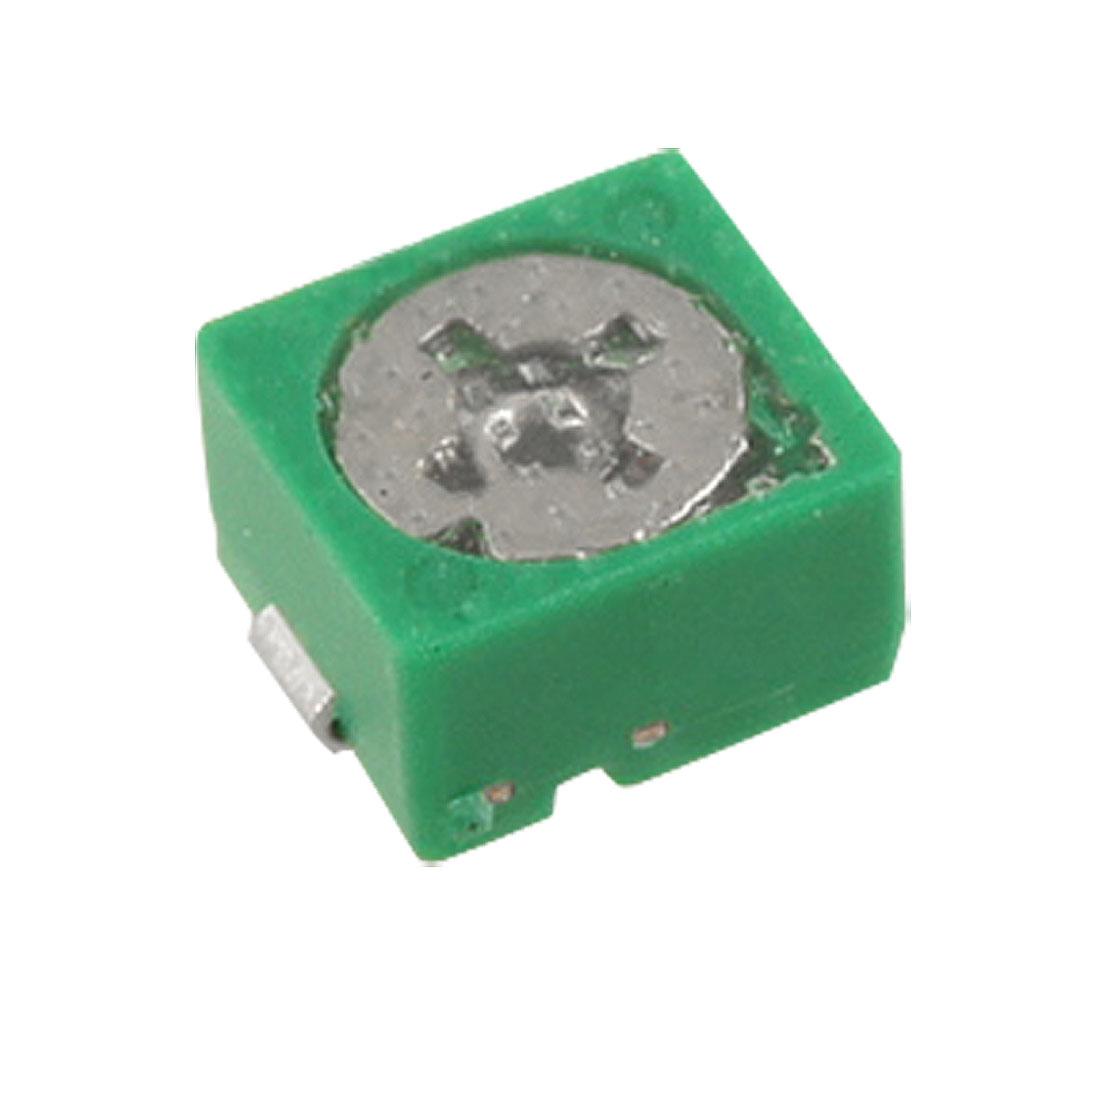 4 x 4mm 6-30pF 5% 220V SMD Ceramic Variable Capacitors 20 Pcs